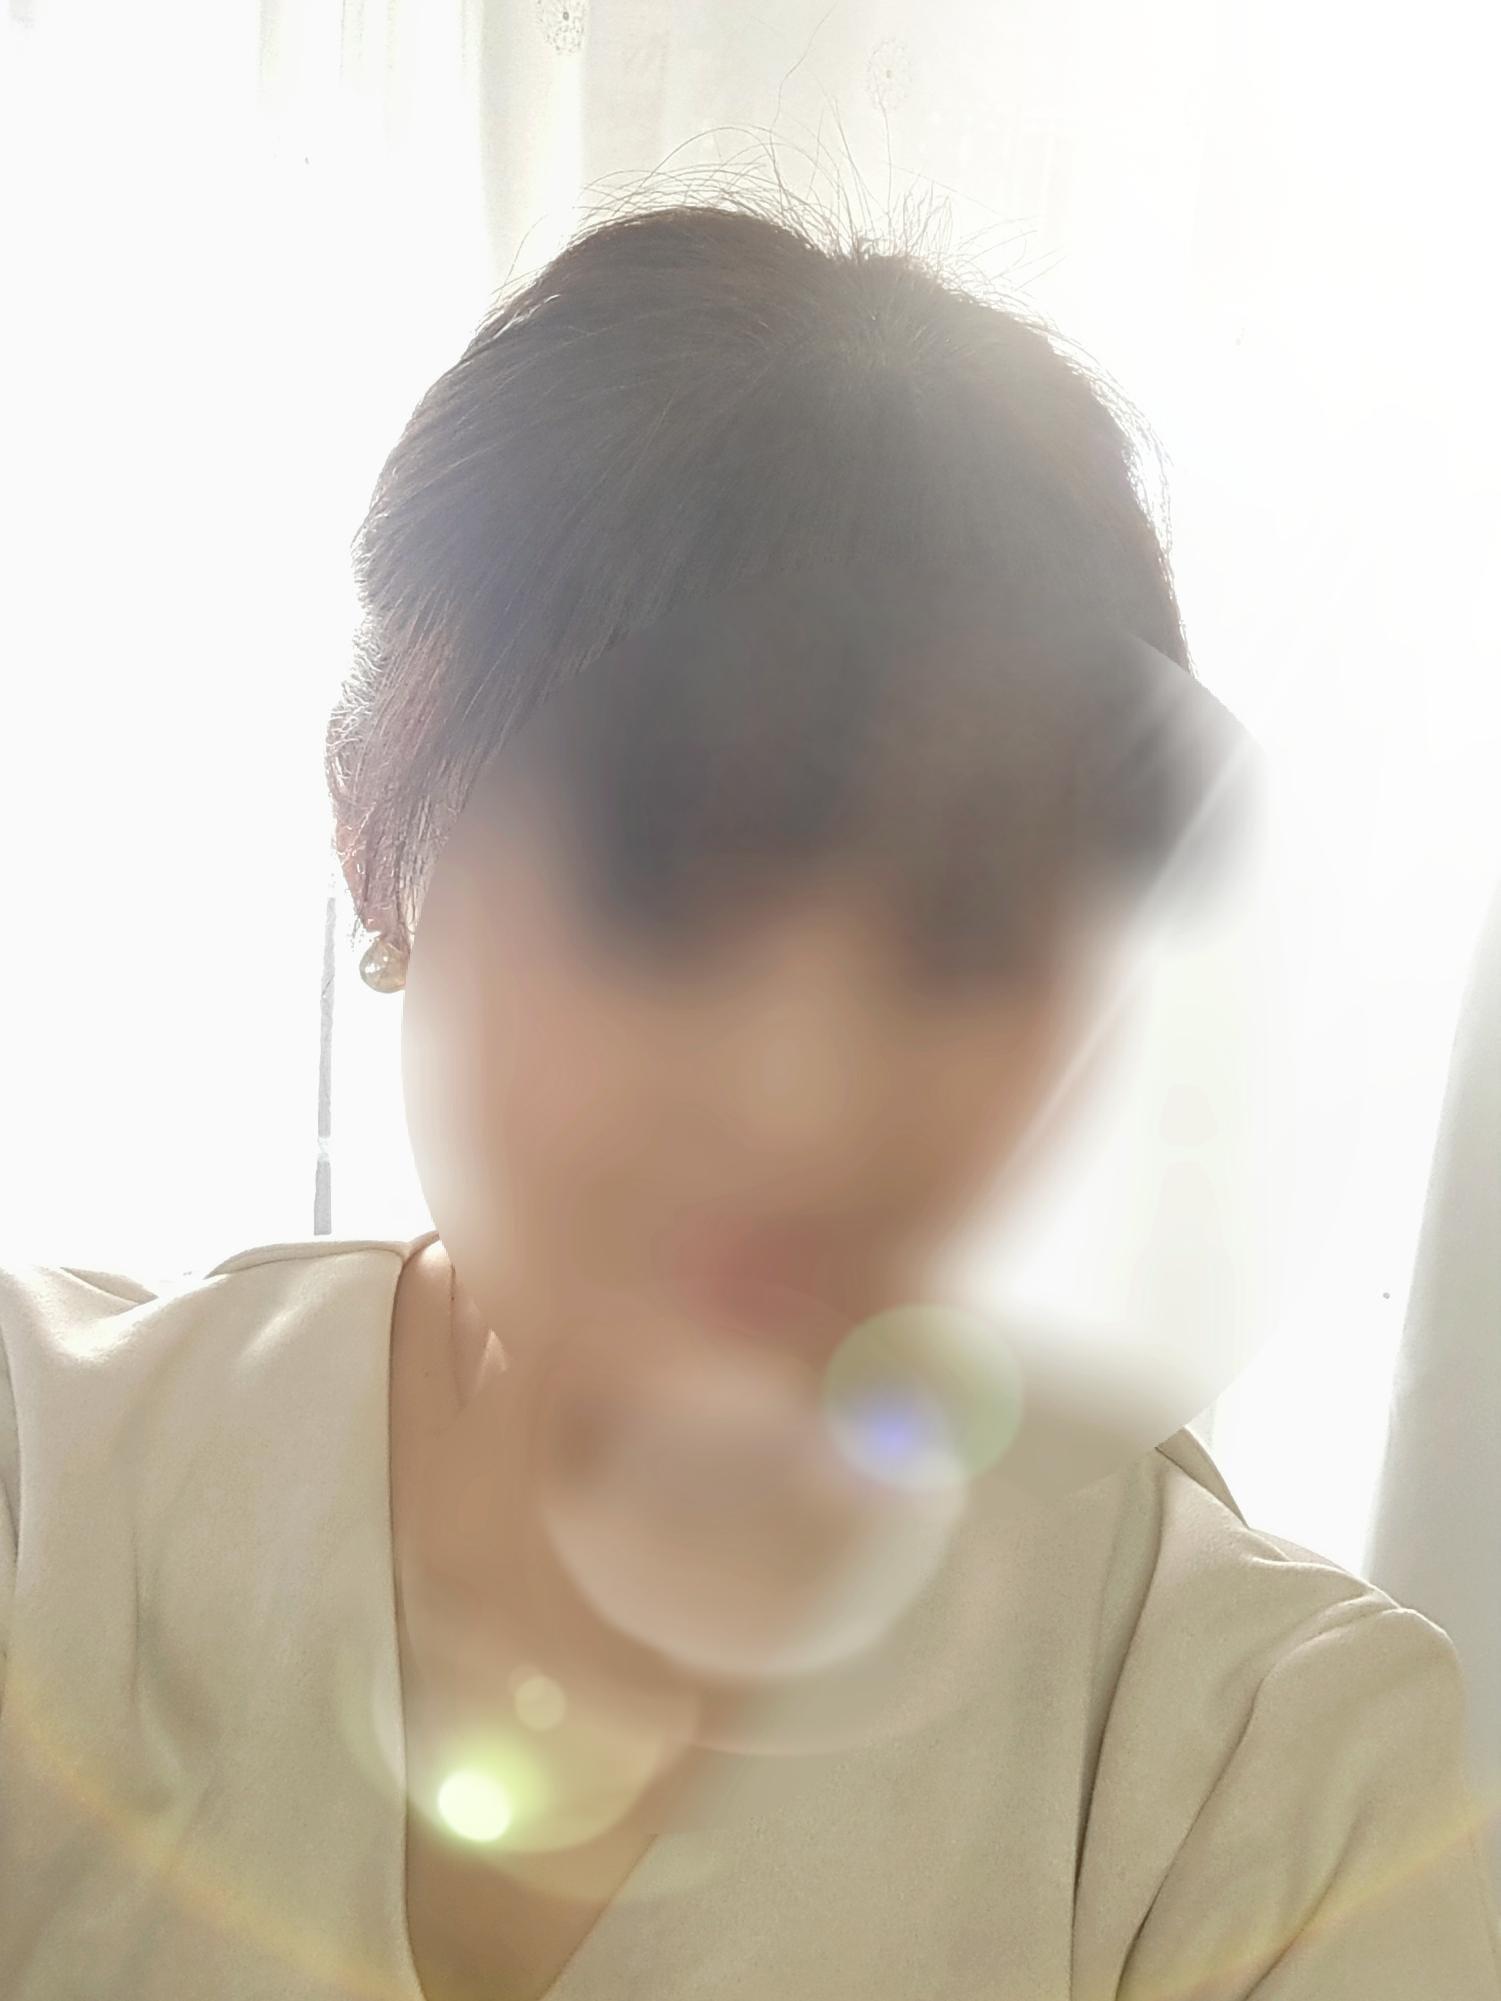 「Yさんへ★」03/20(03/20) 17:34 | 梨花子の写メ・風俗動画